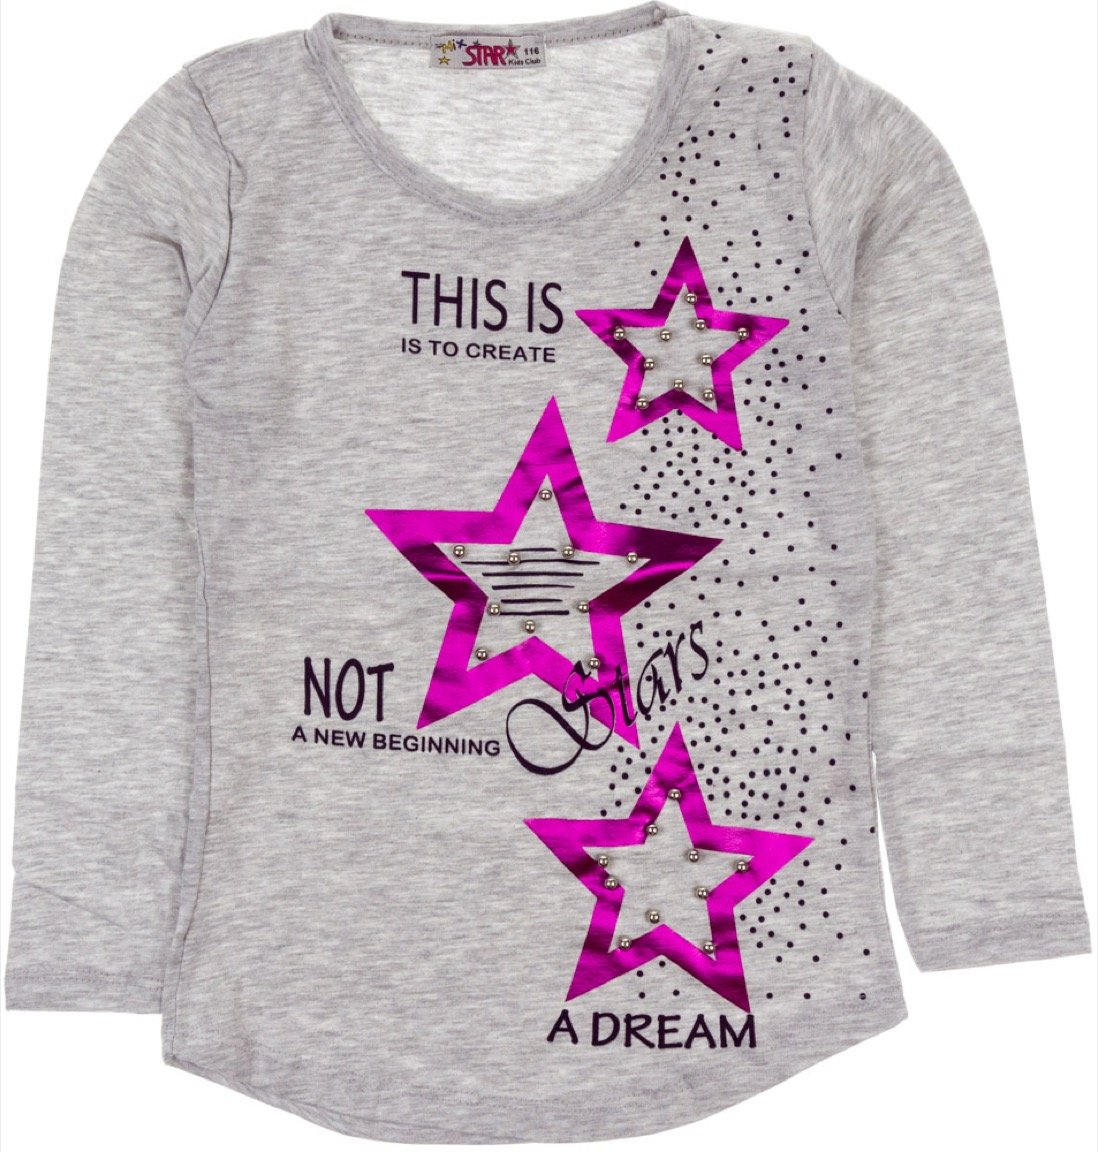 Mix Star παιδική εποχιακή μπλούζα «Dream Grey Stars»